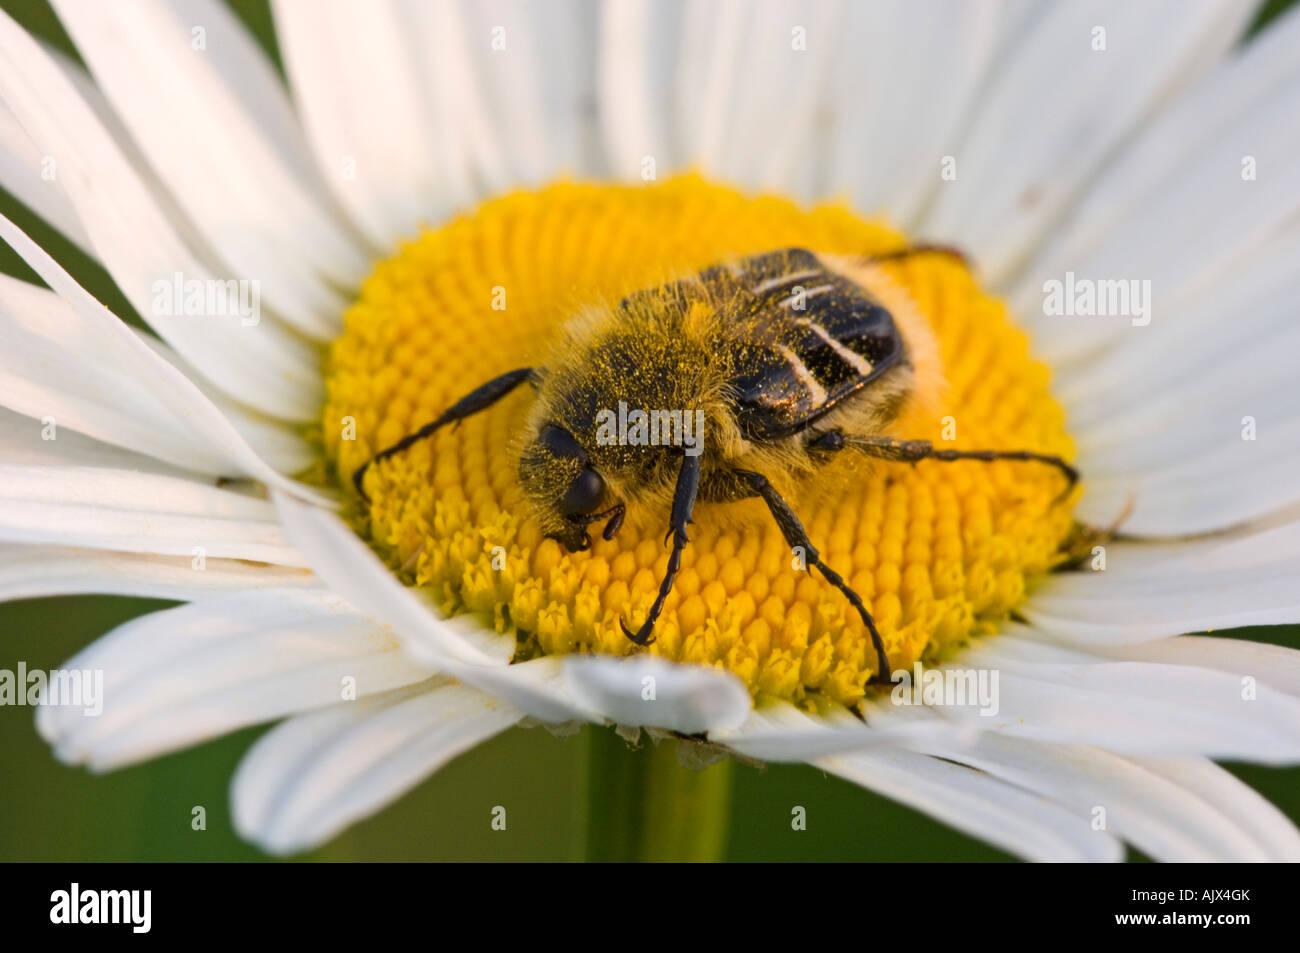 Plant Pollination Worksheet